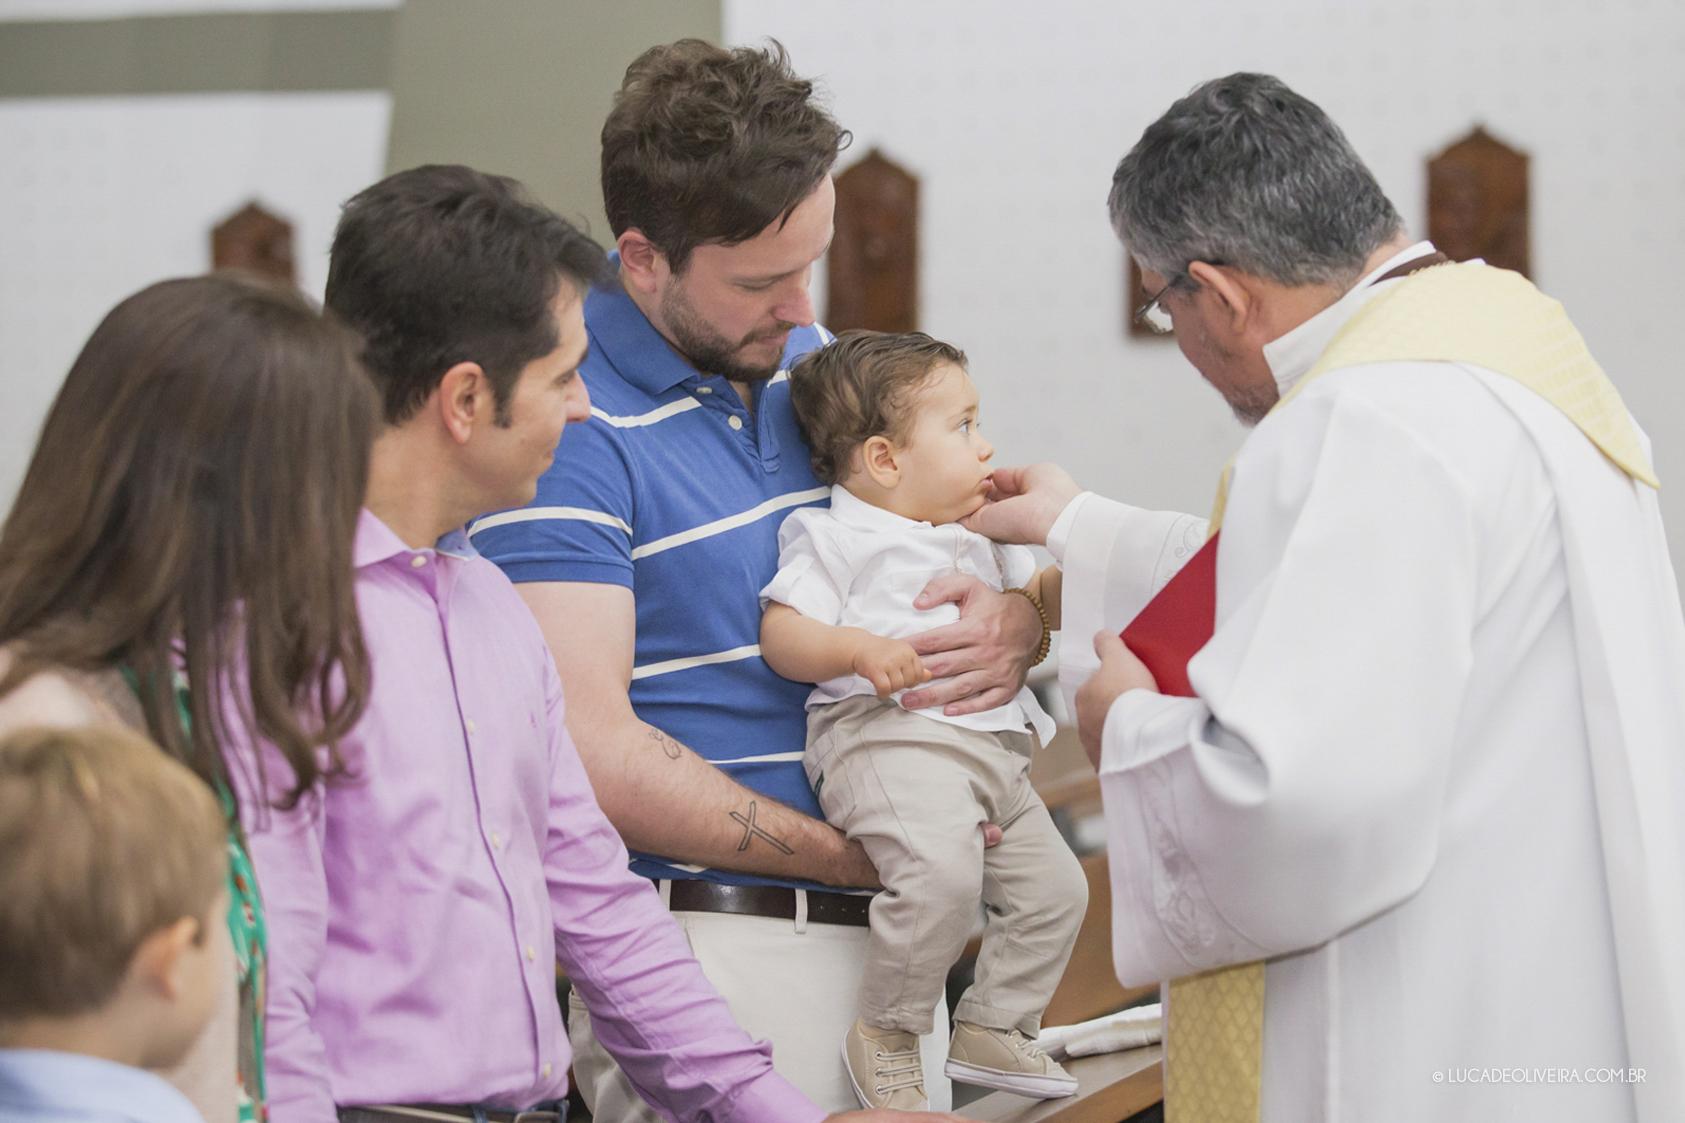 batizadosaopedorsaopaulo_lucadeoliveira_020-2-2